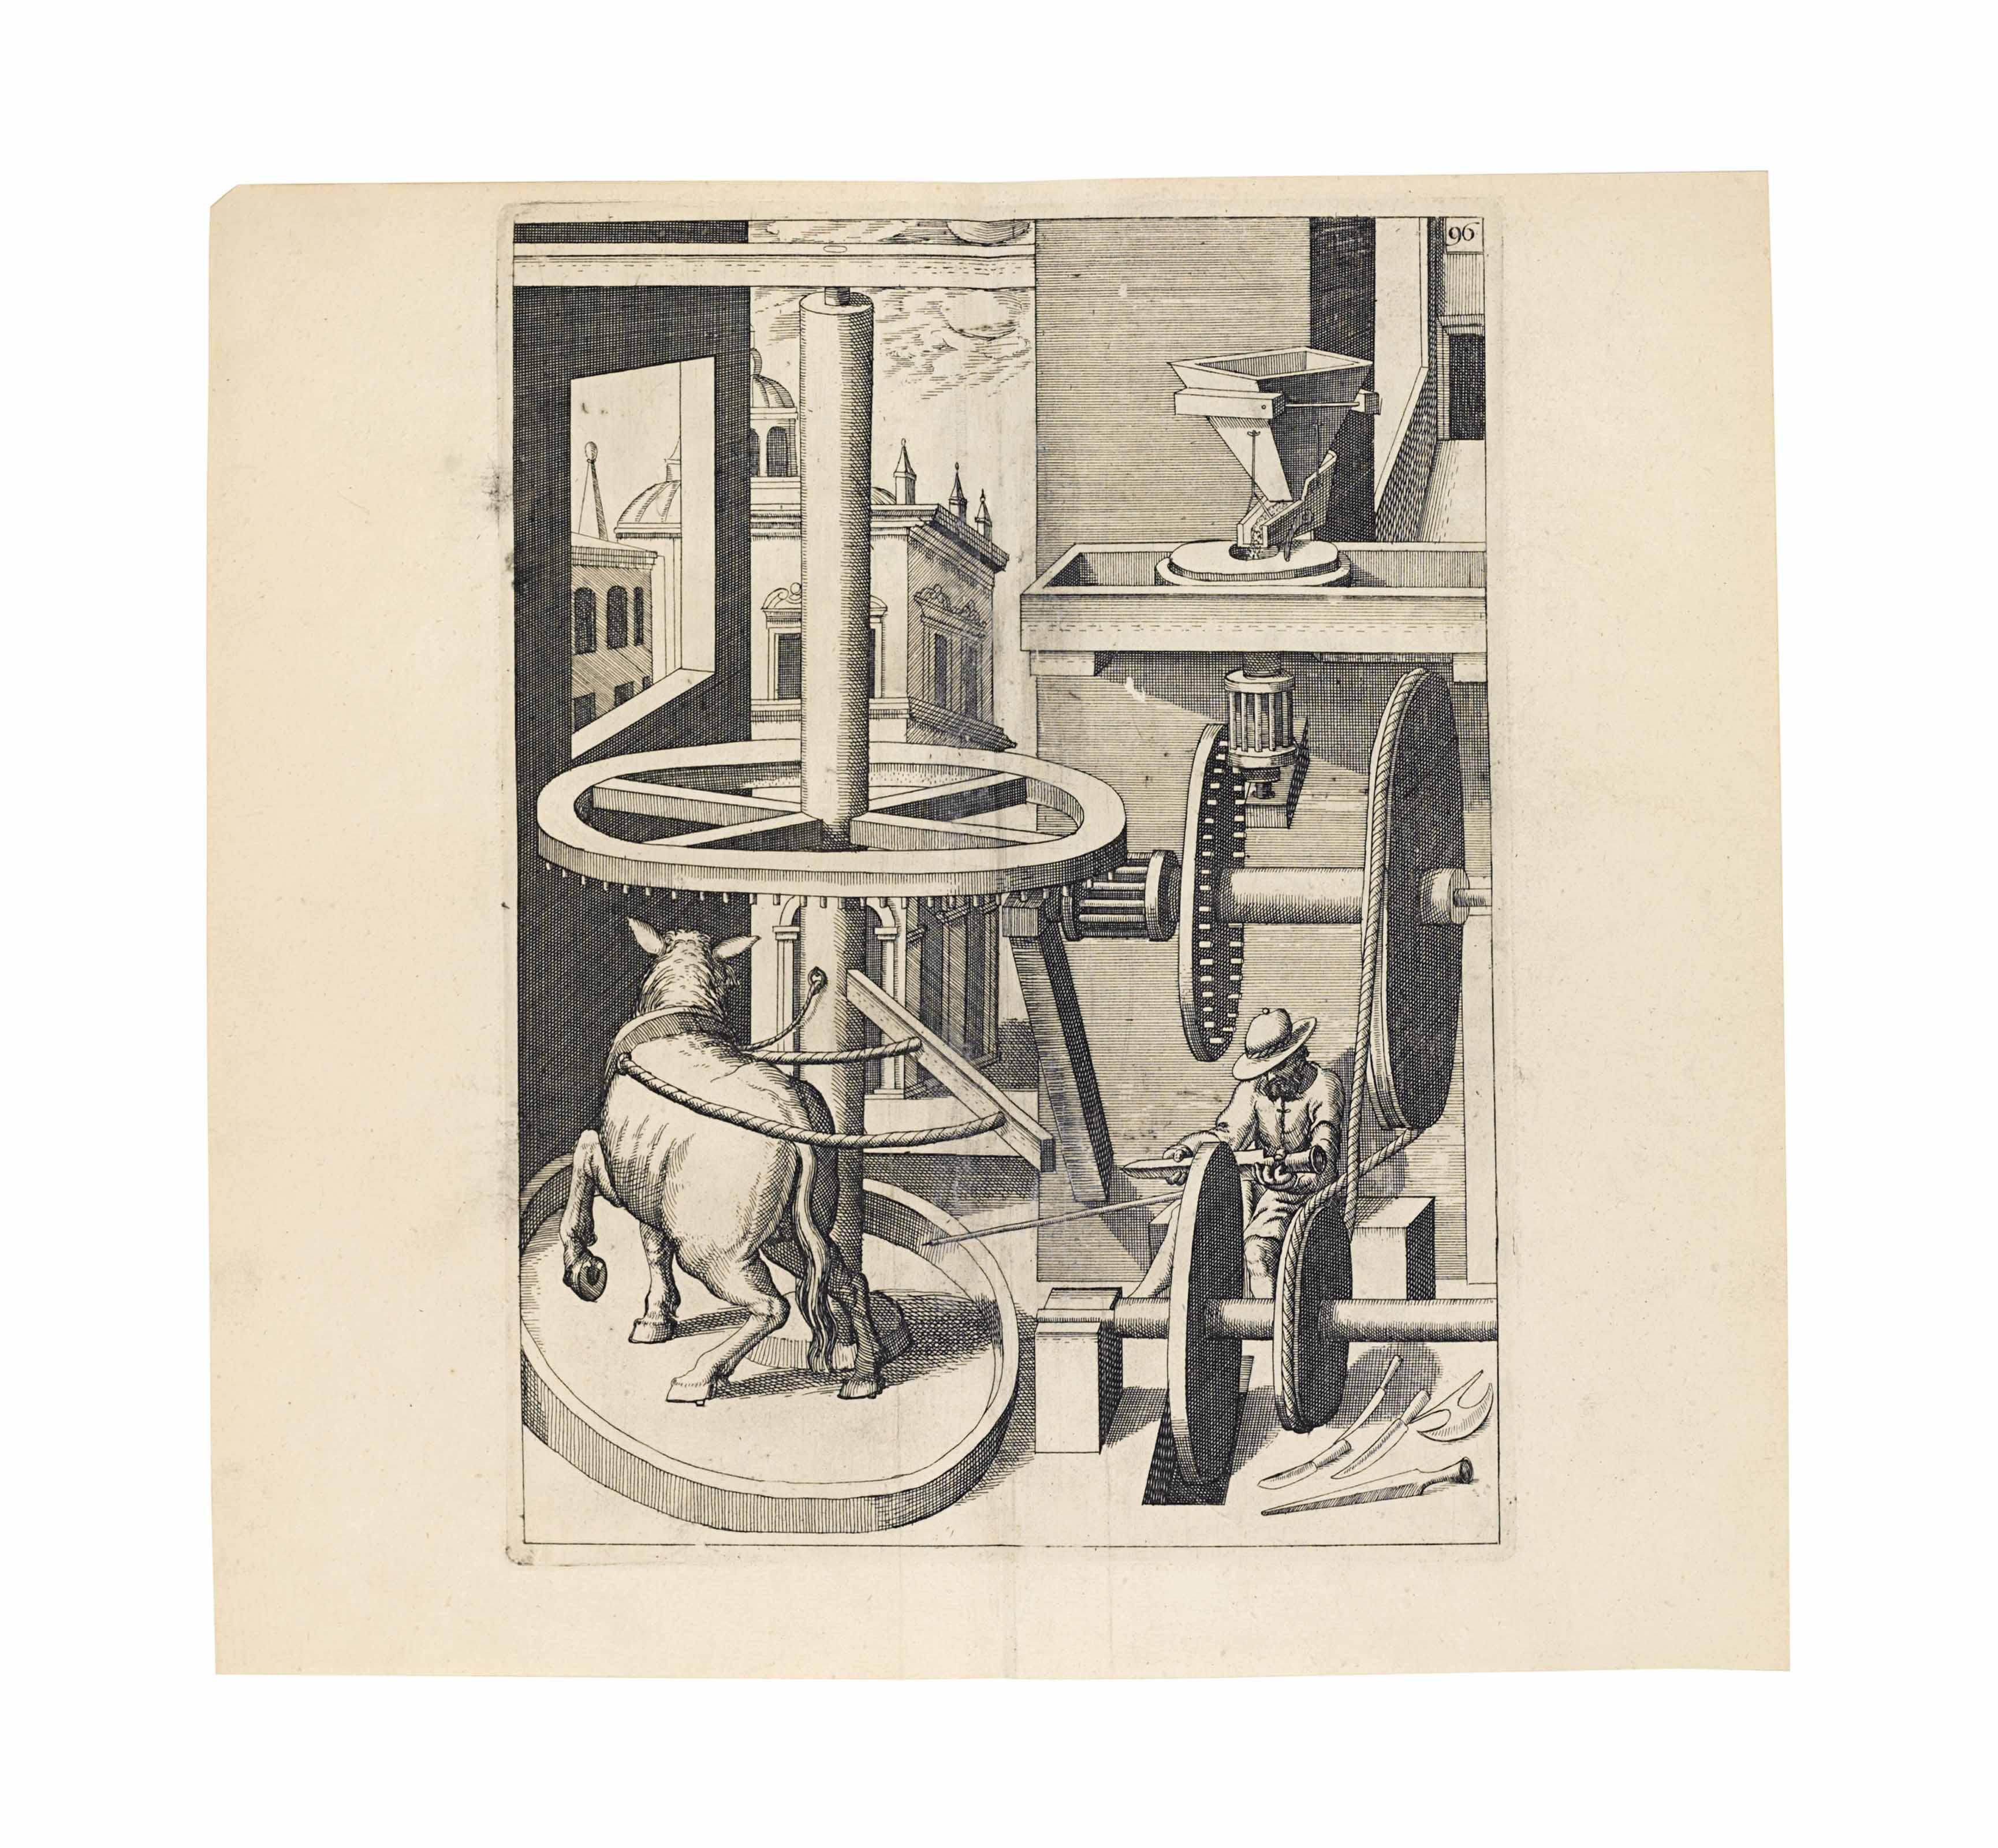 STRADA, Jacobus de (c. 1523-1588) and Octavius de STRADA. Kunstliche Abriss allerhand Wasser, Wind, Ross und Handt Mühlen. Frankfurt: Paul Jacobi for the author, and sold by Lukas Jennis, 1617 - 1618.